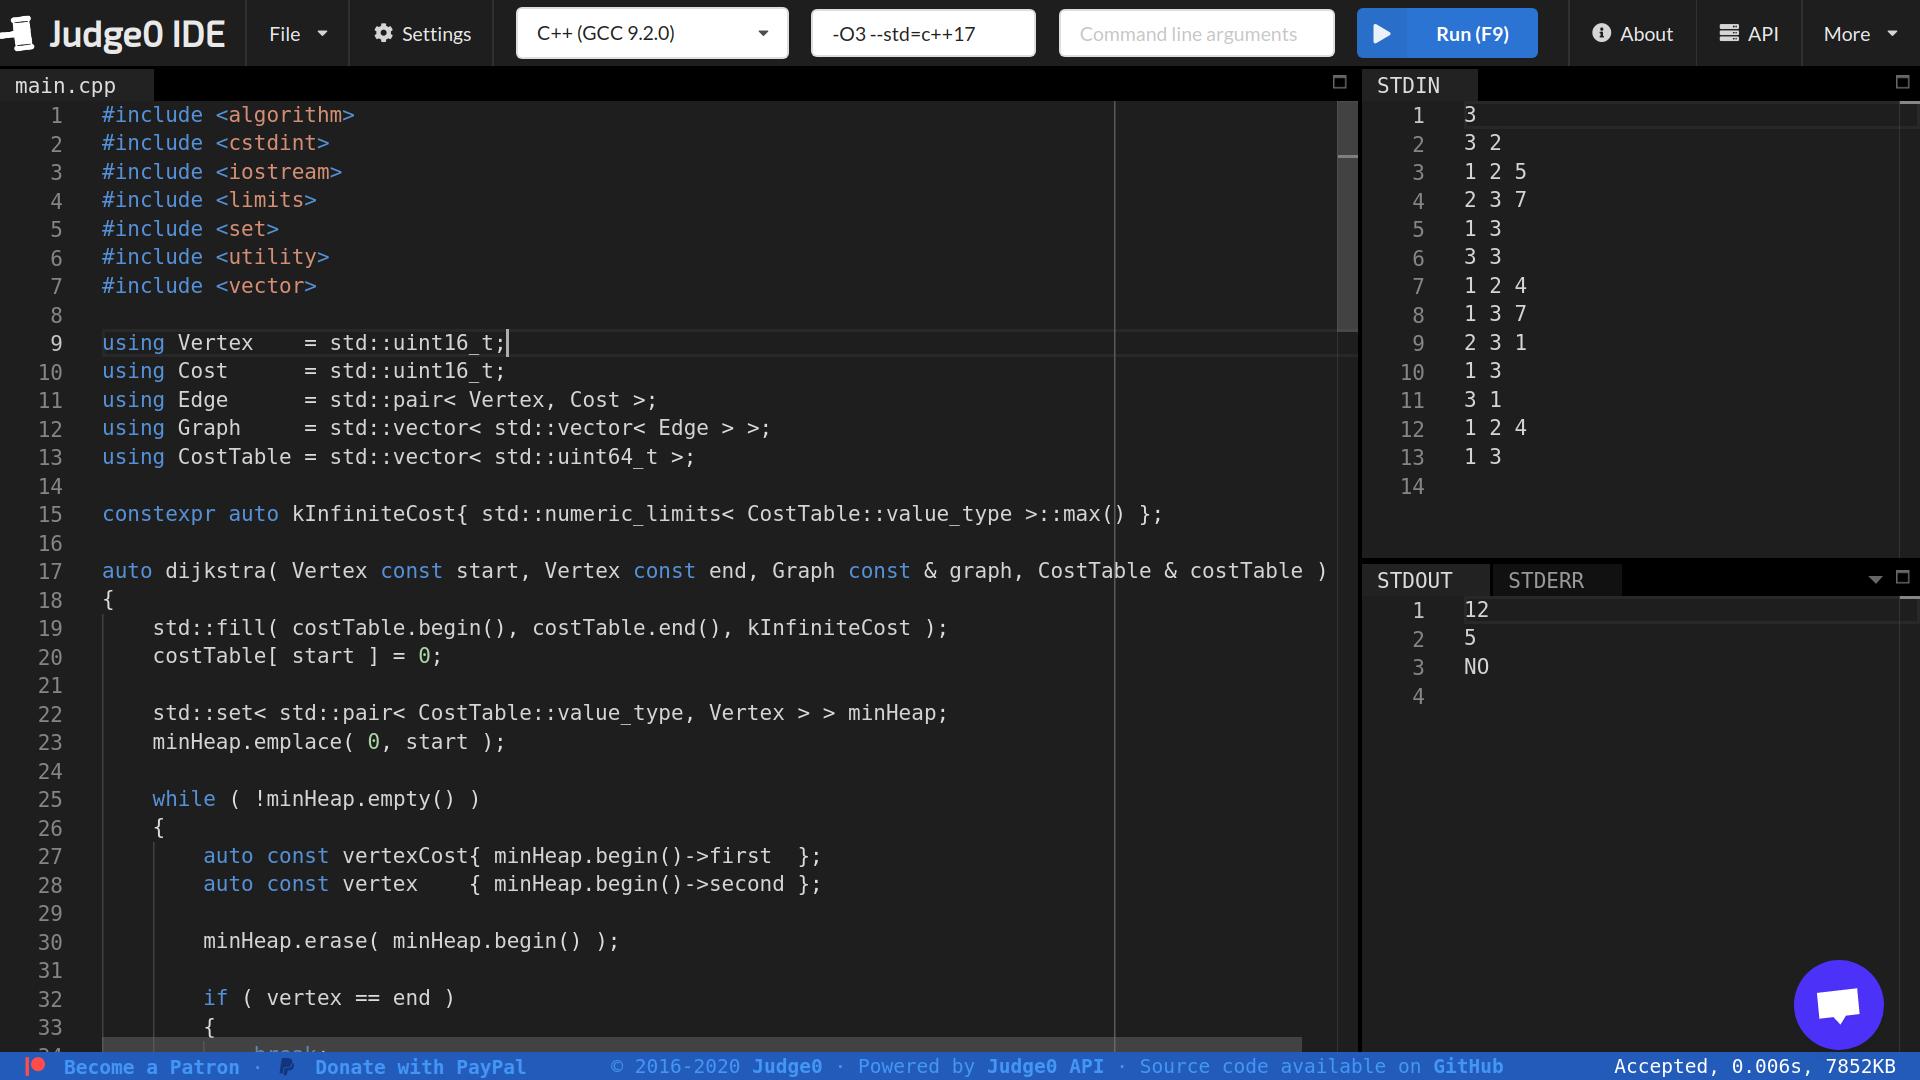 Judge0 IDE Screenshot